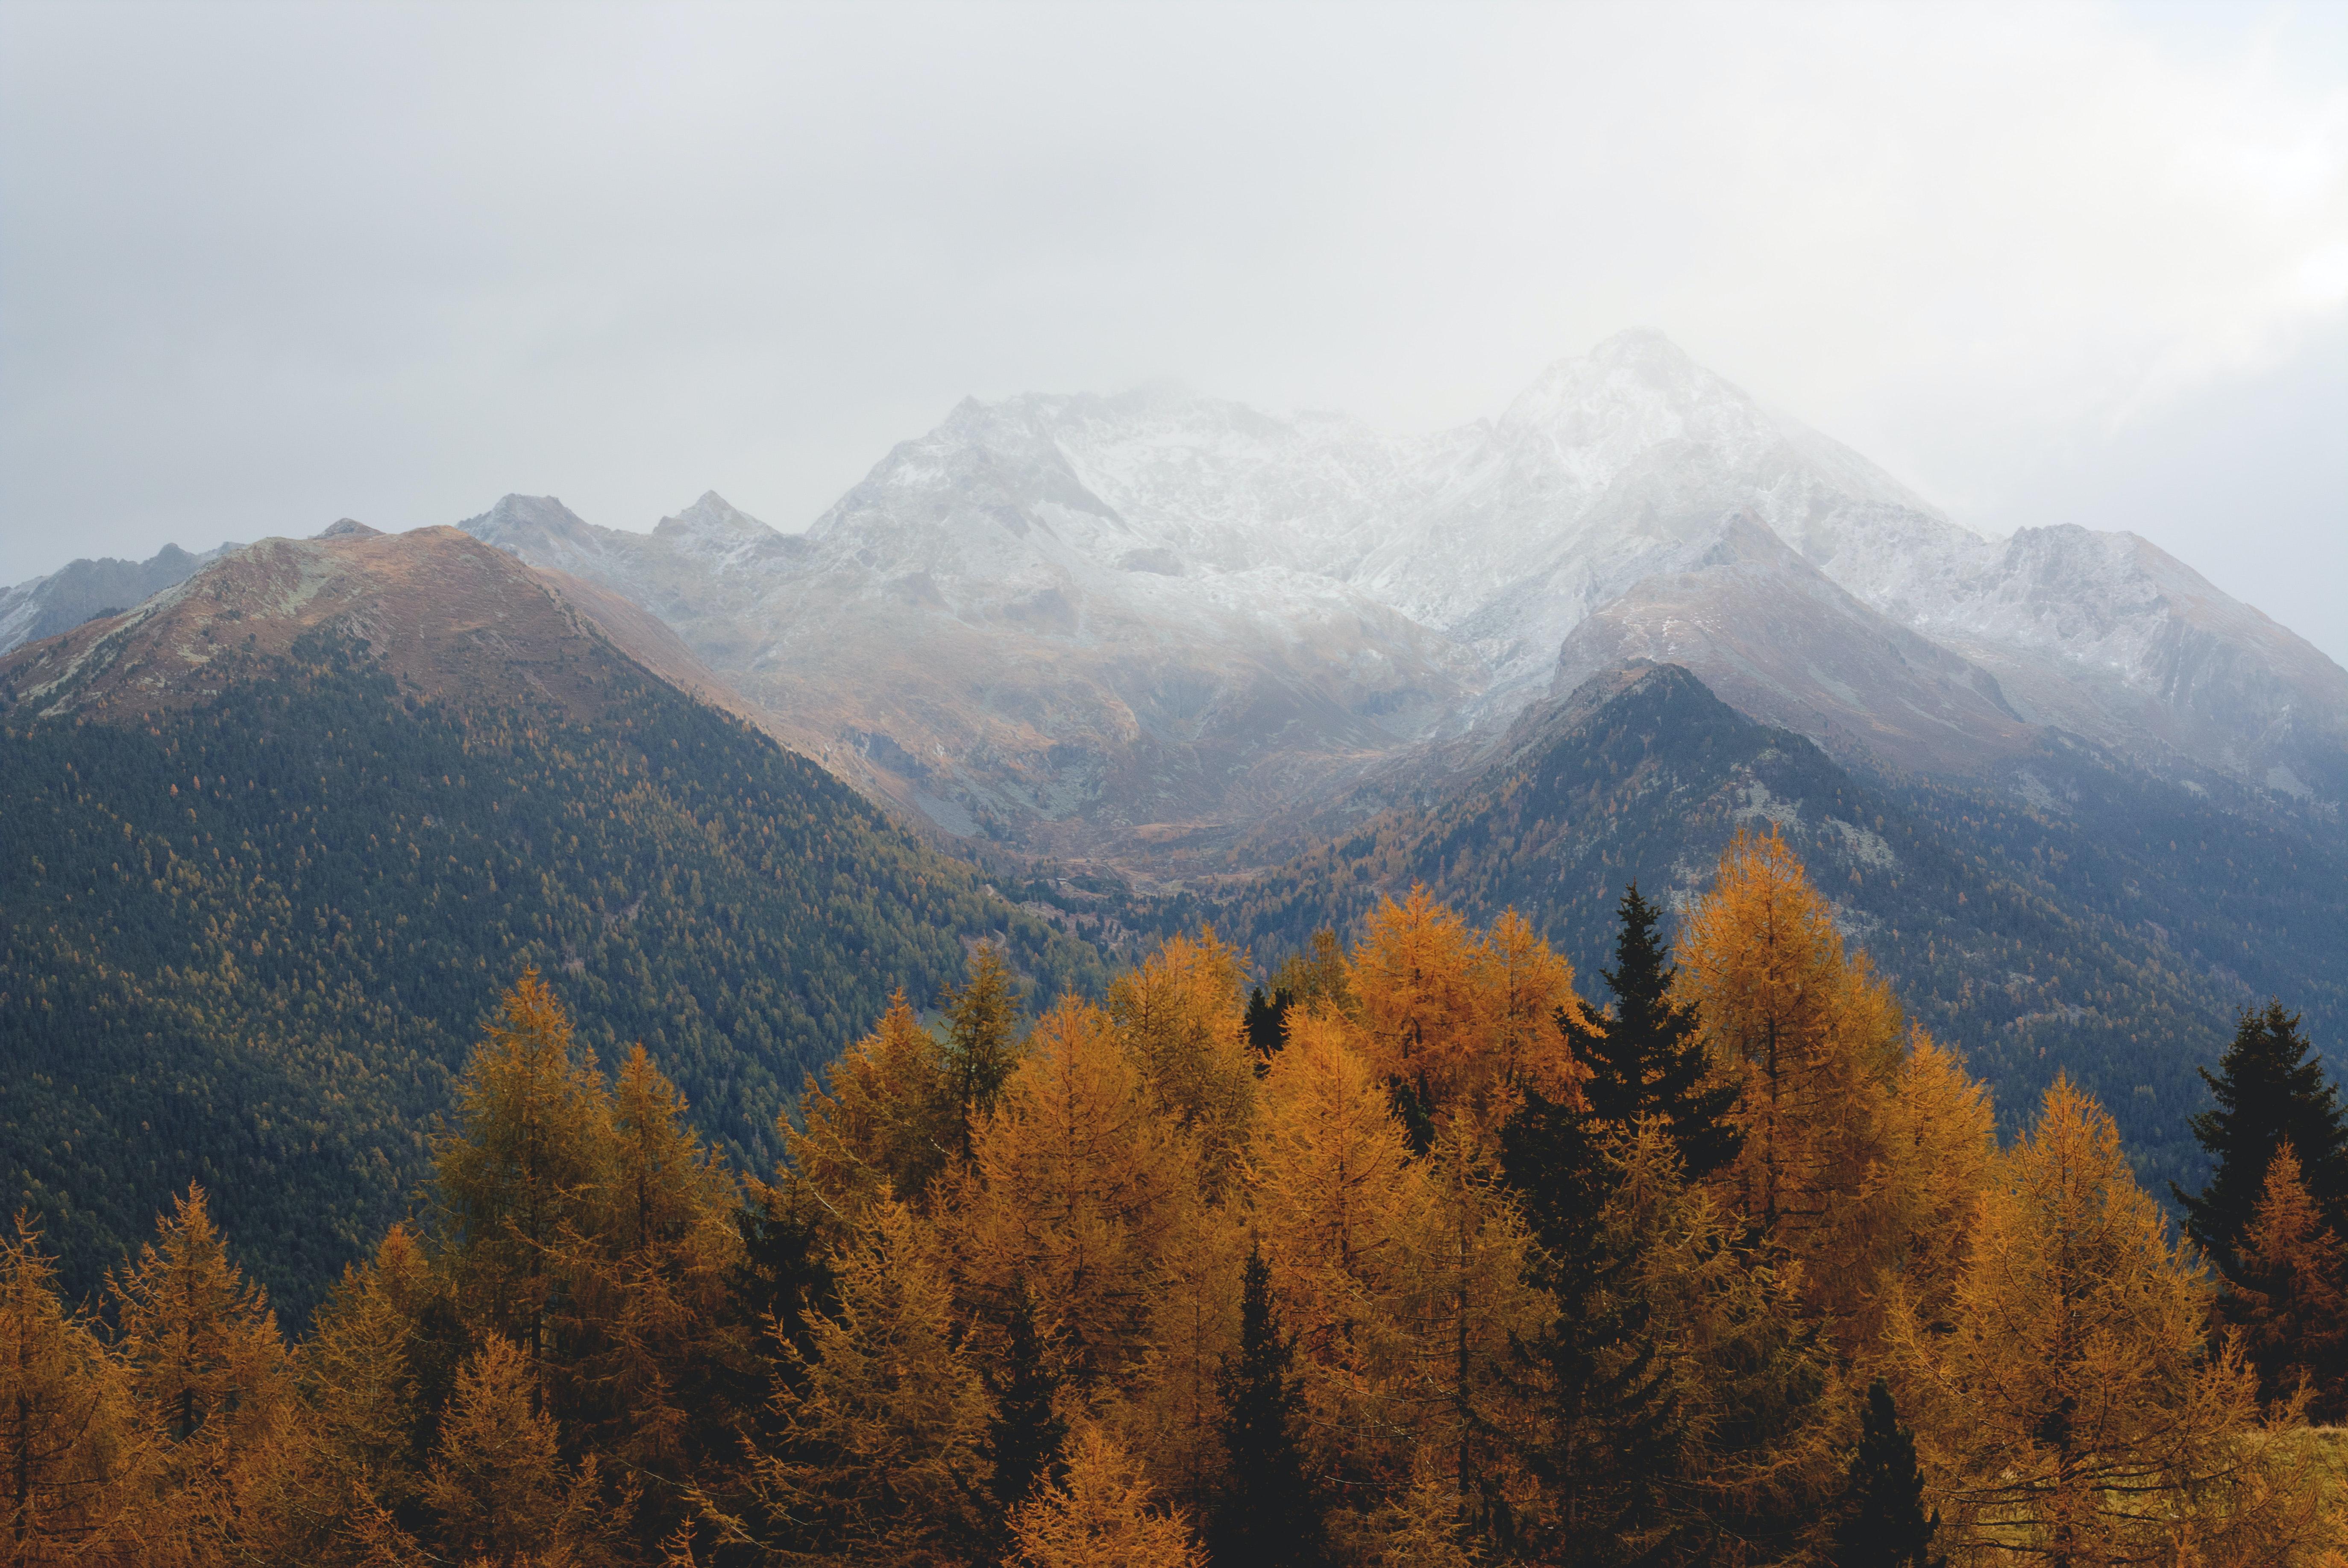 desktop wallpaper pexels free stock photos